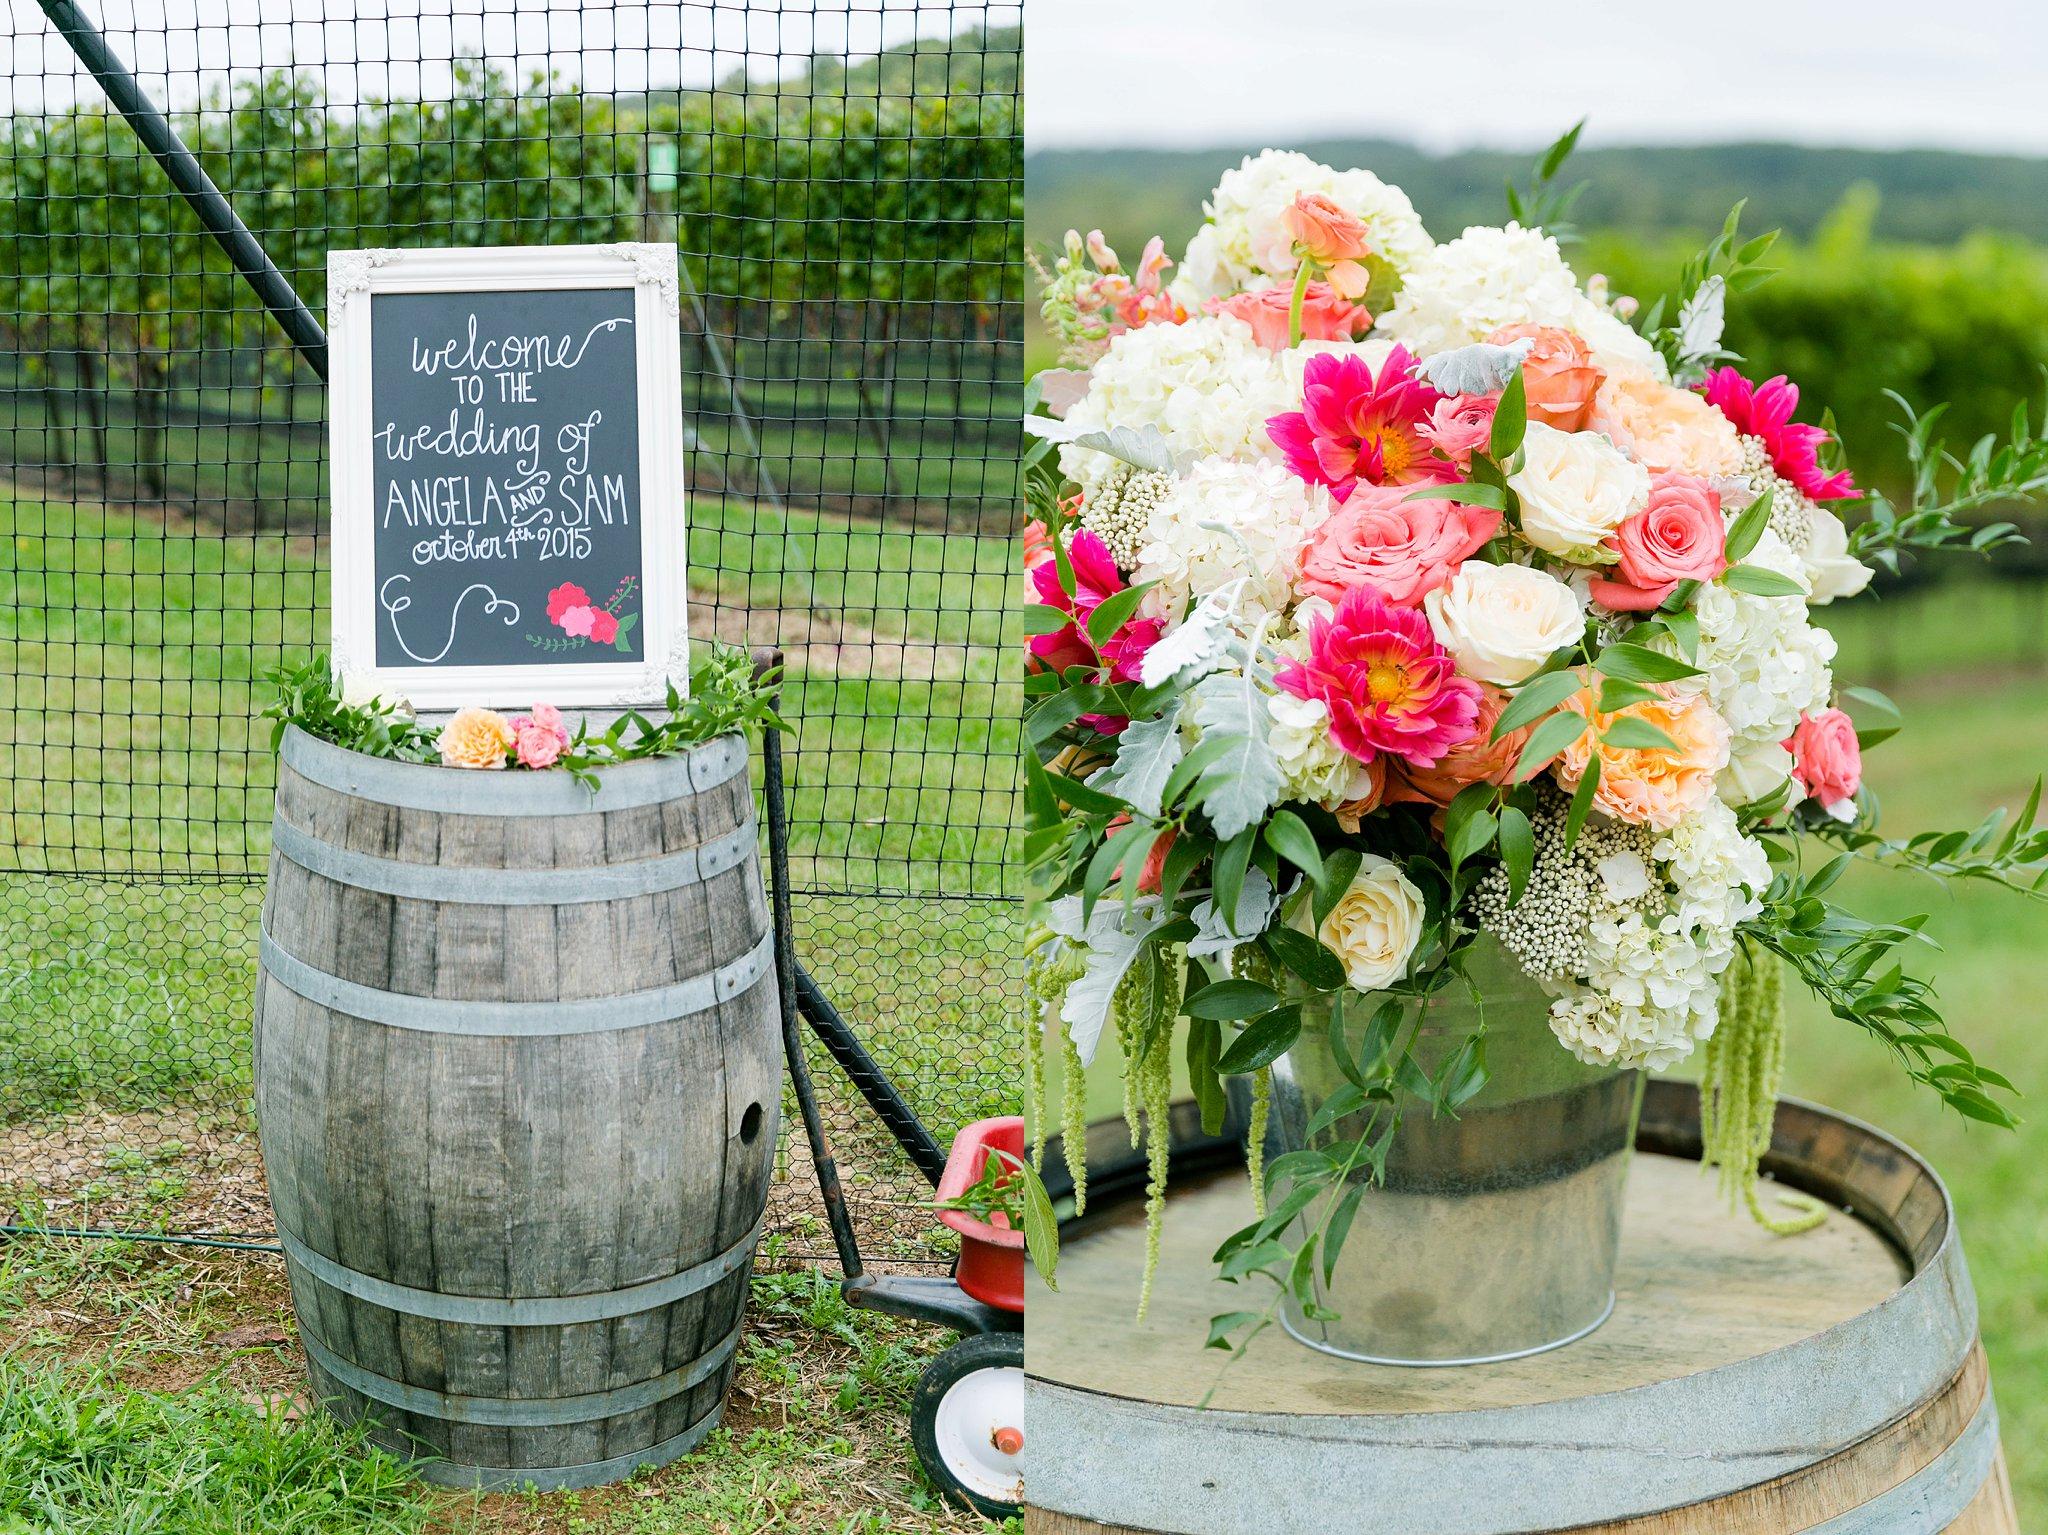 Stone Tower Winery Wedding Photos Virginia Wedding Photographer Megan Kelsey Photography Sam & Angela-111.jpg